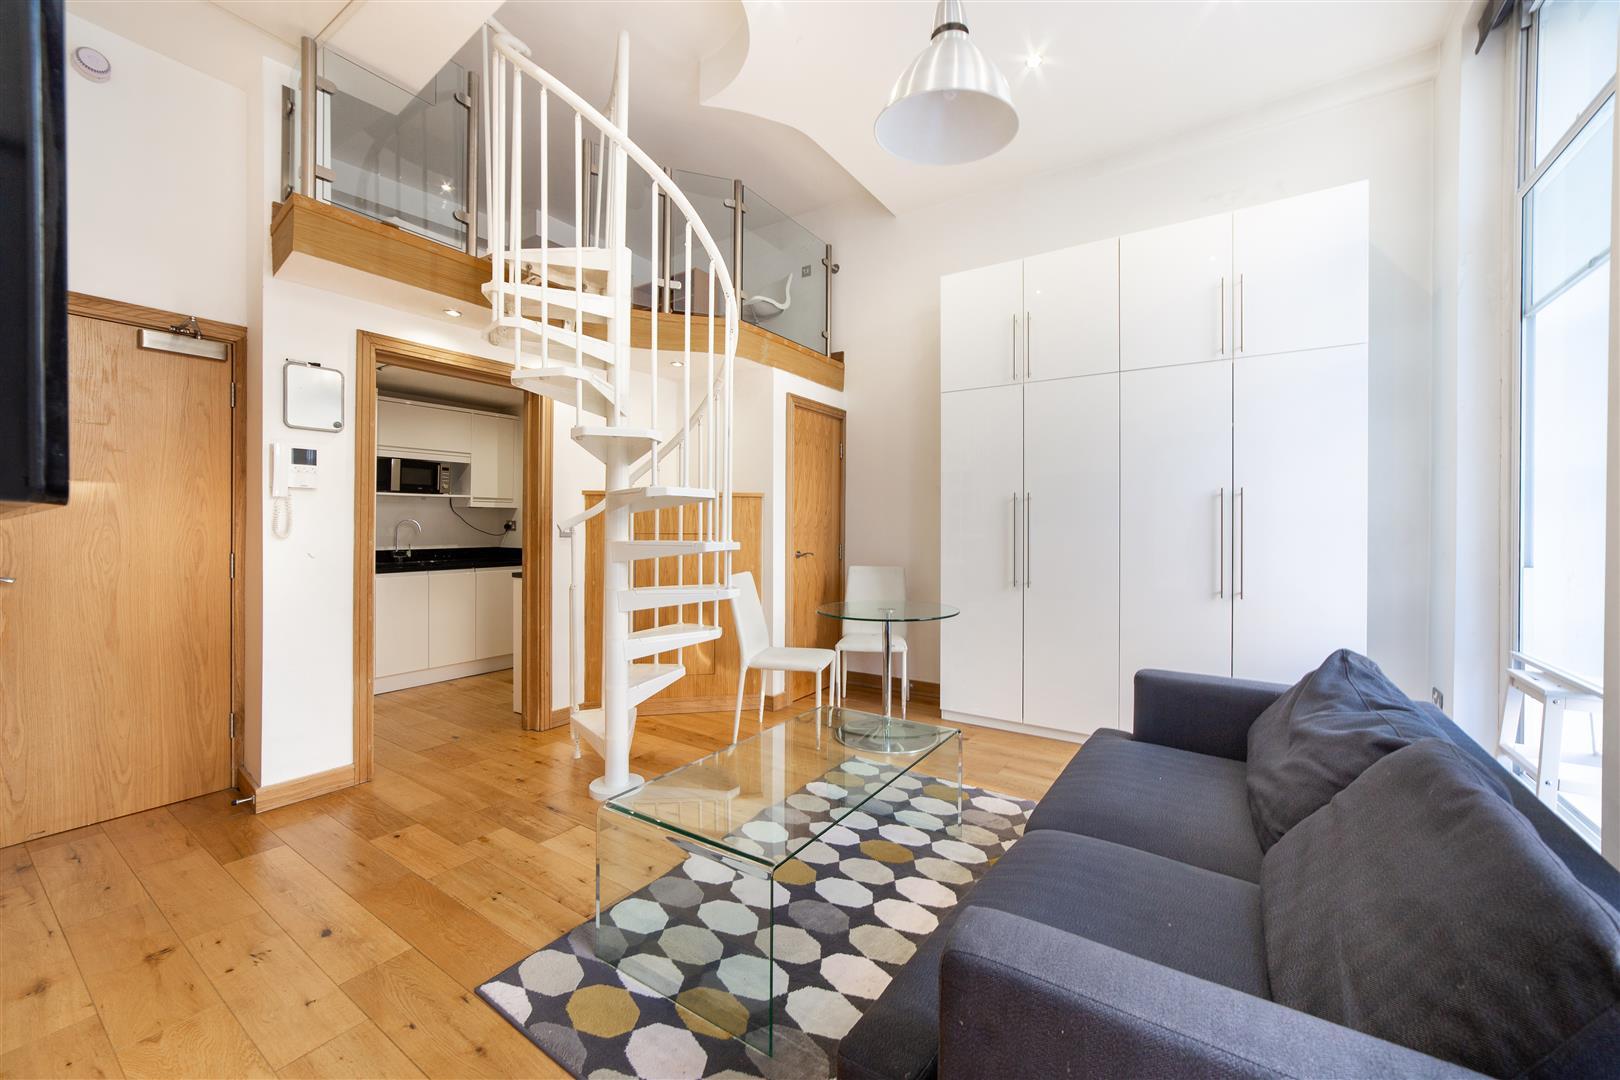 2 bed apartment to rent in Grainger Street, Newcastle Upon Tyne, NE1